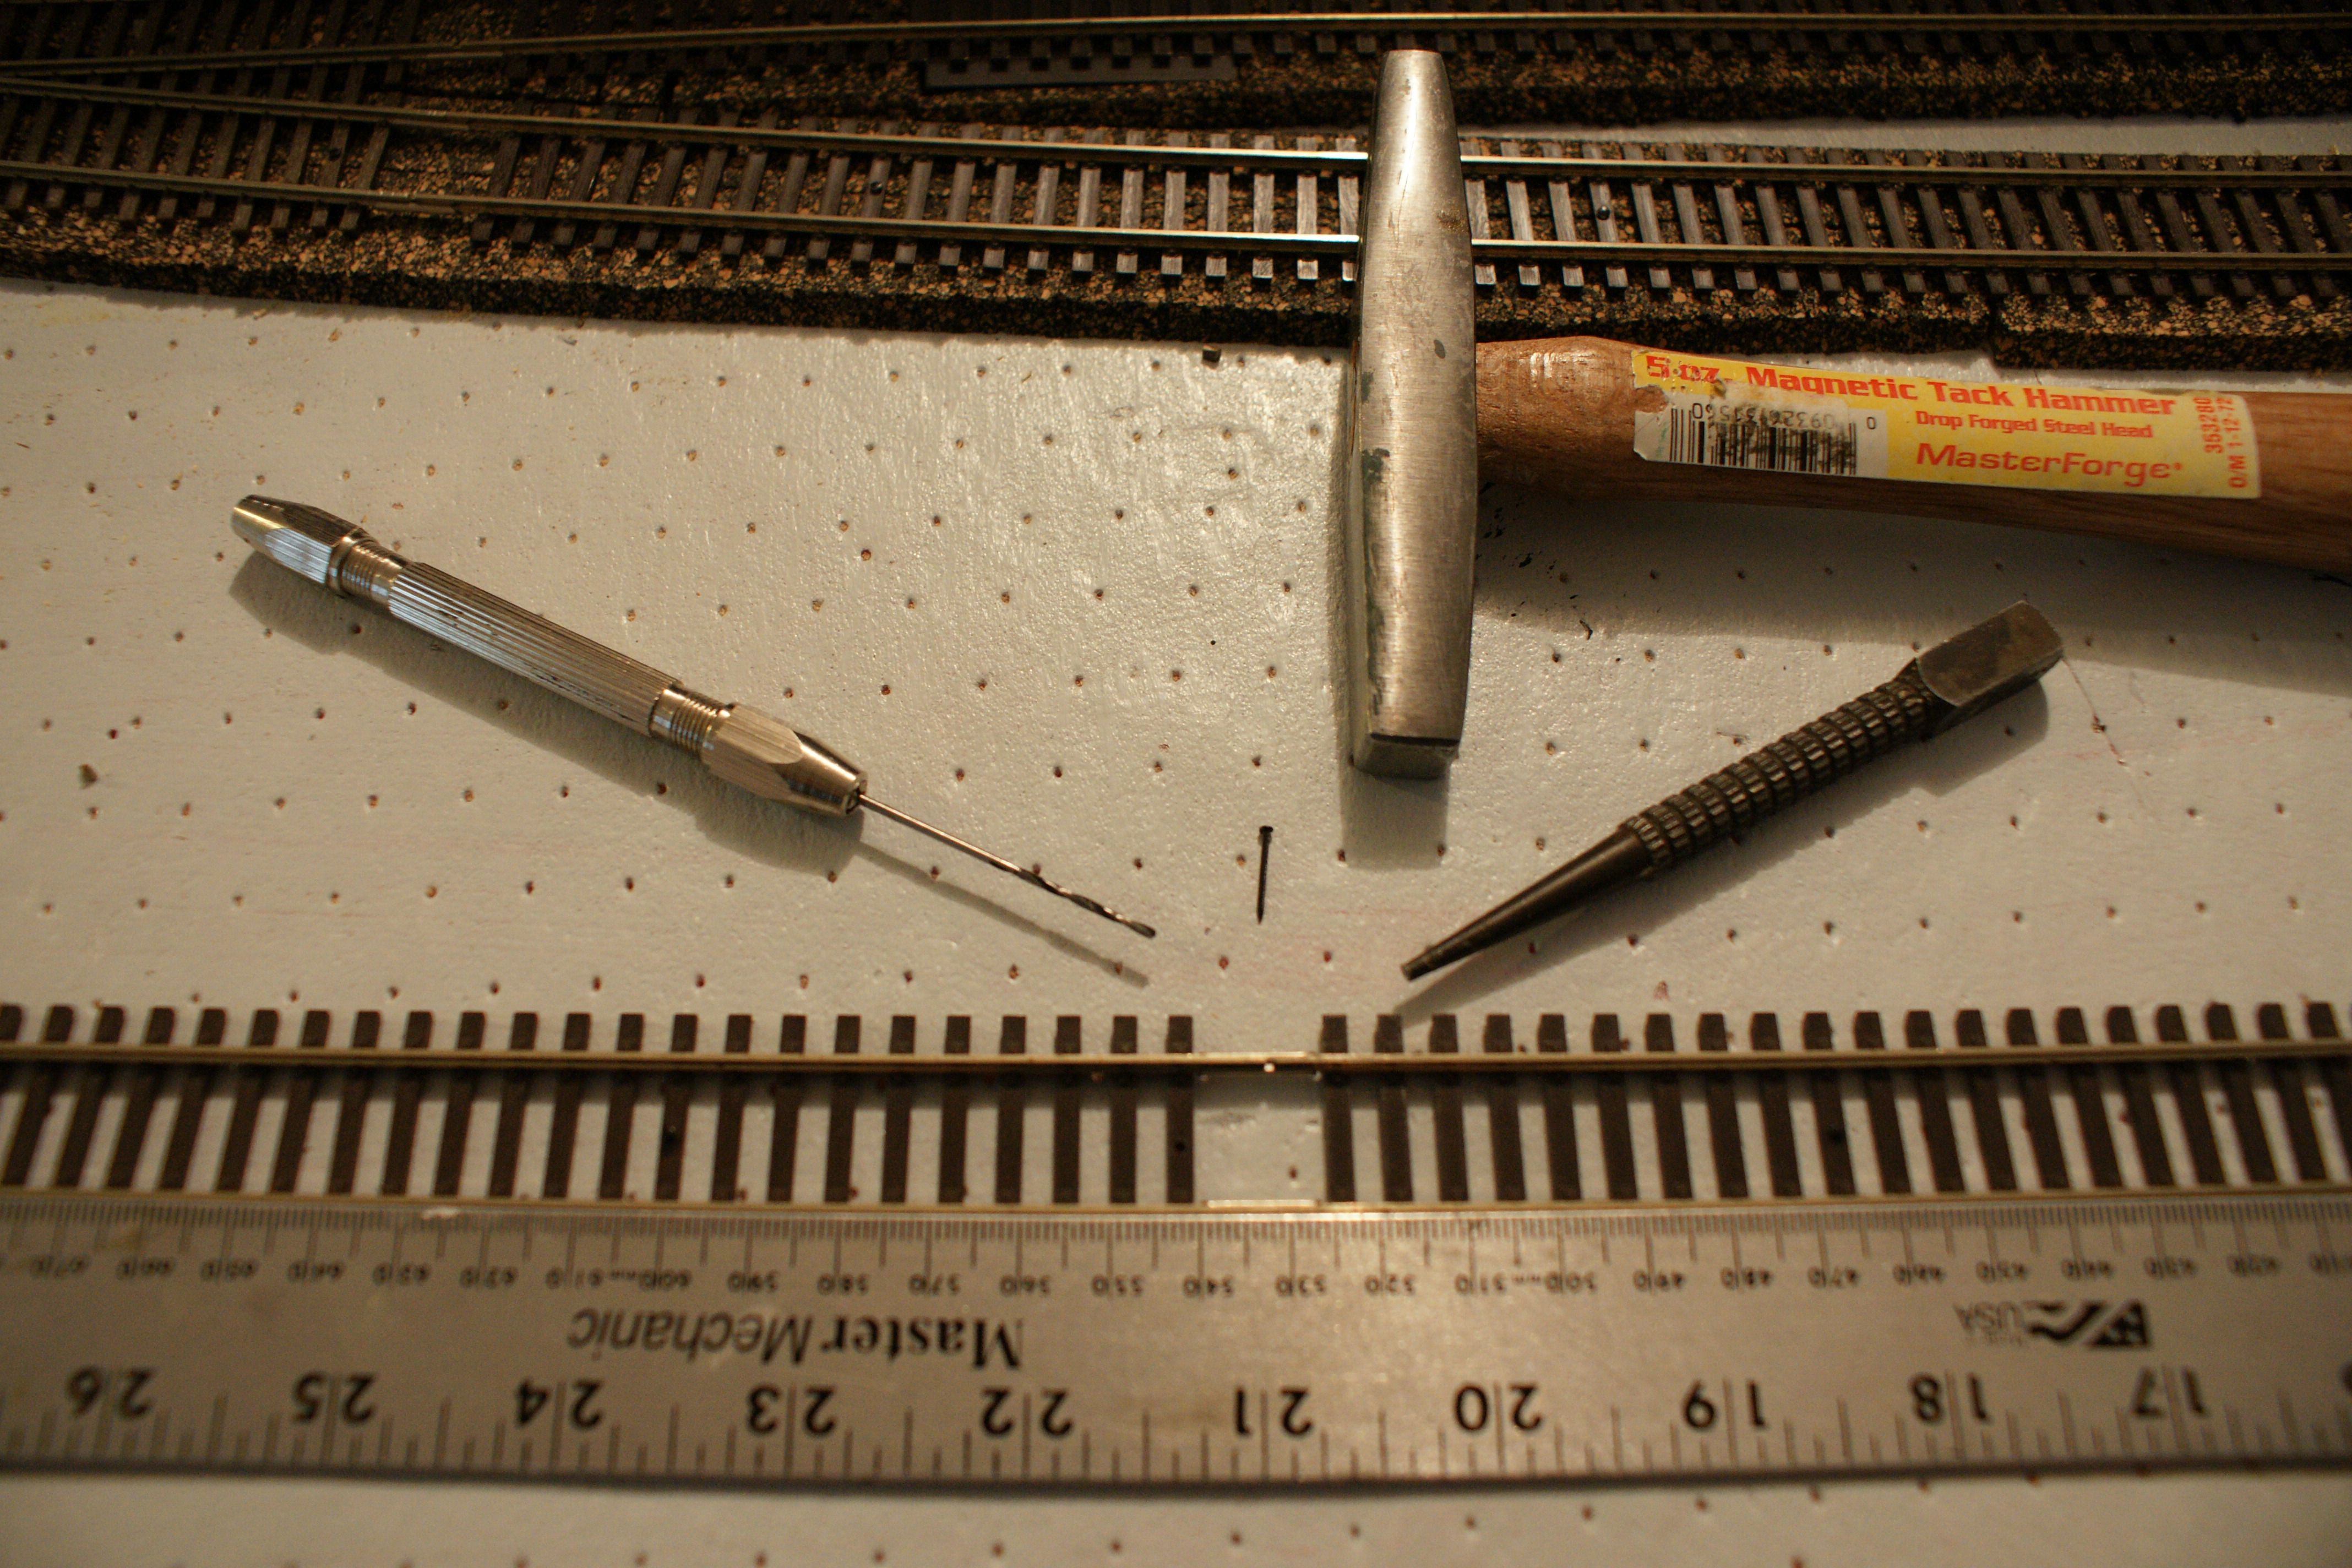 Model train flex track and steel straight edge